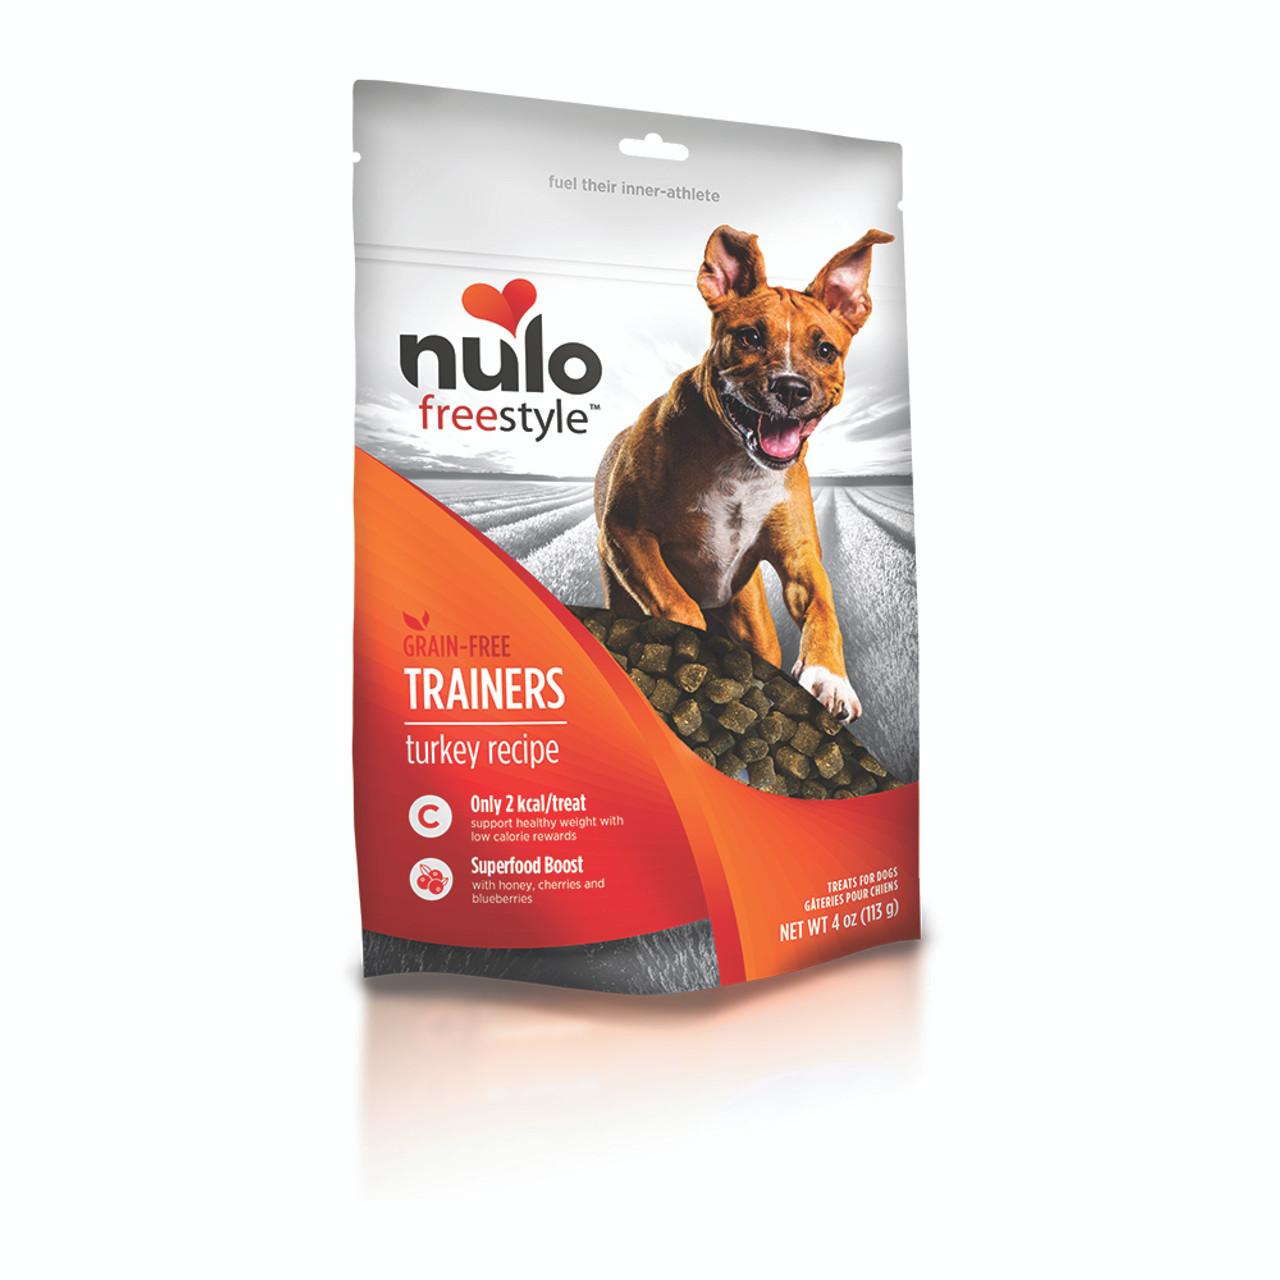 Nulo Freestyle Grain-Free Trainers Turkey Recipe Dog Training Treats